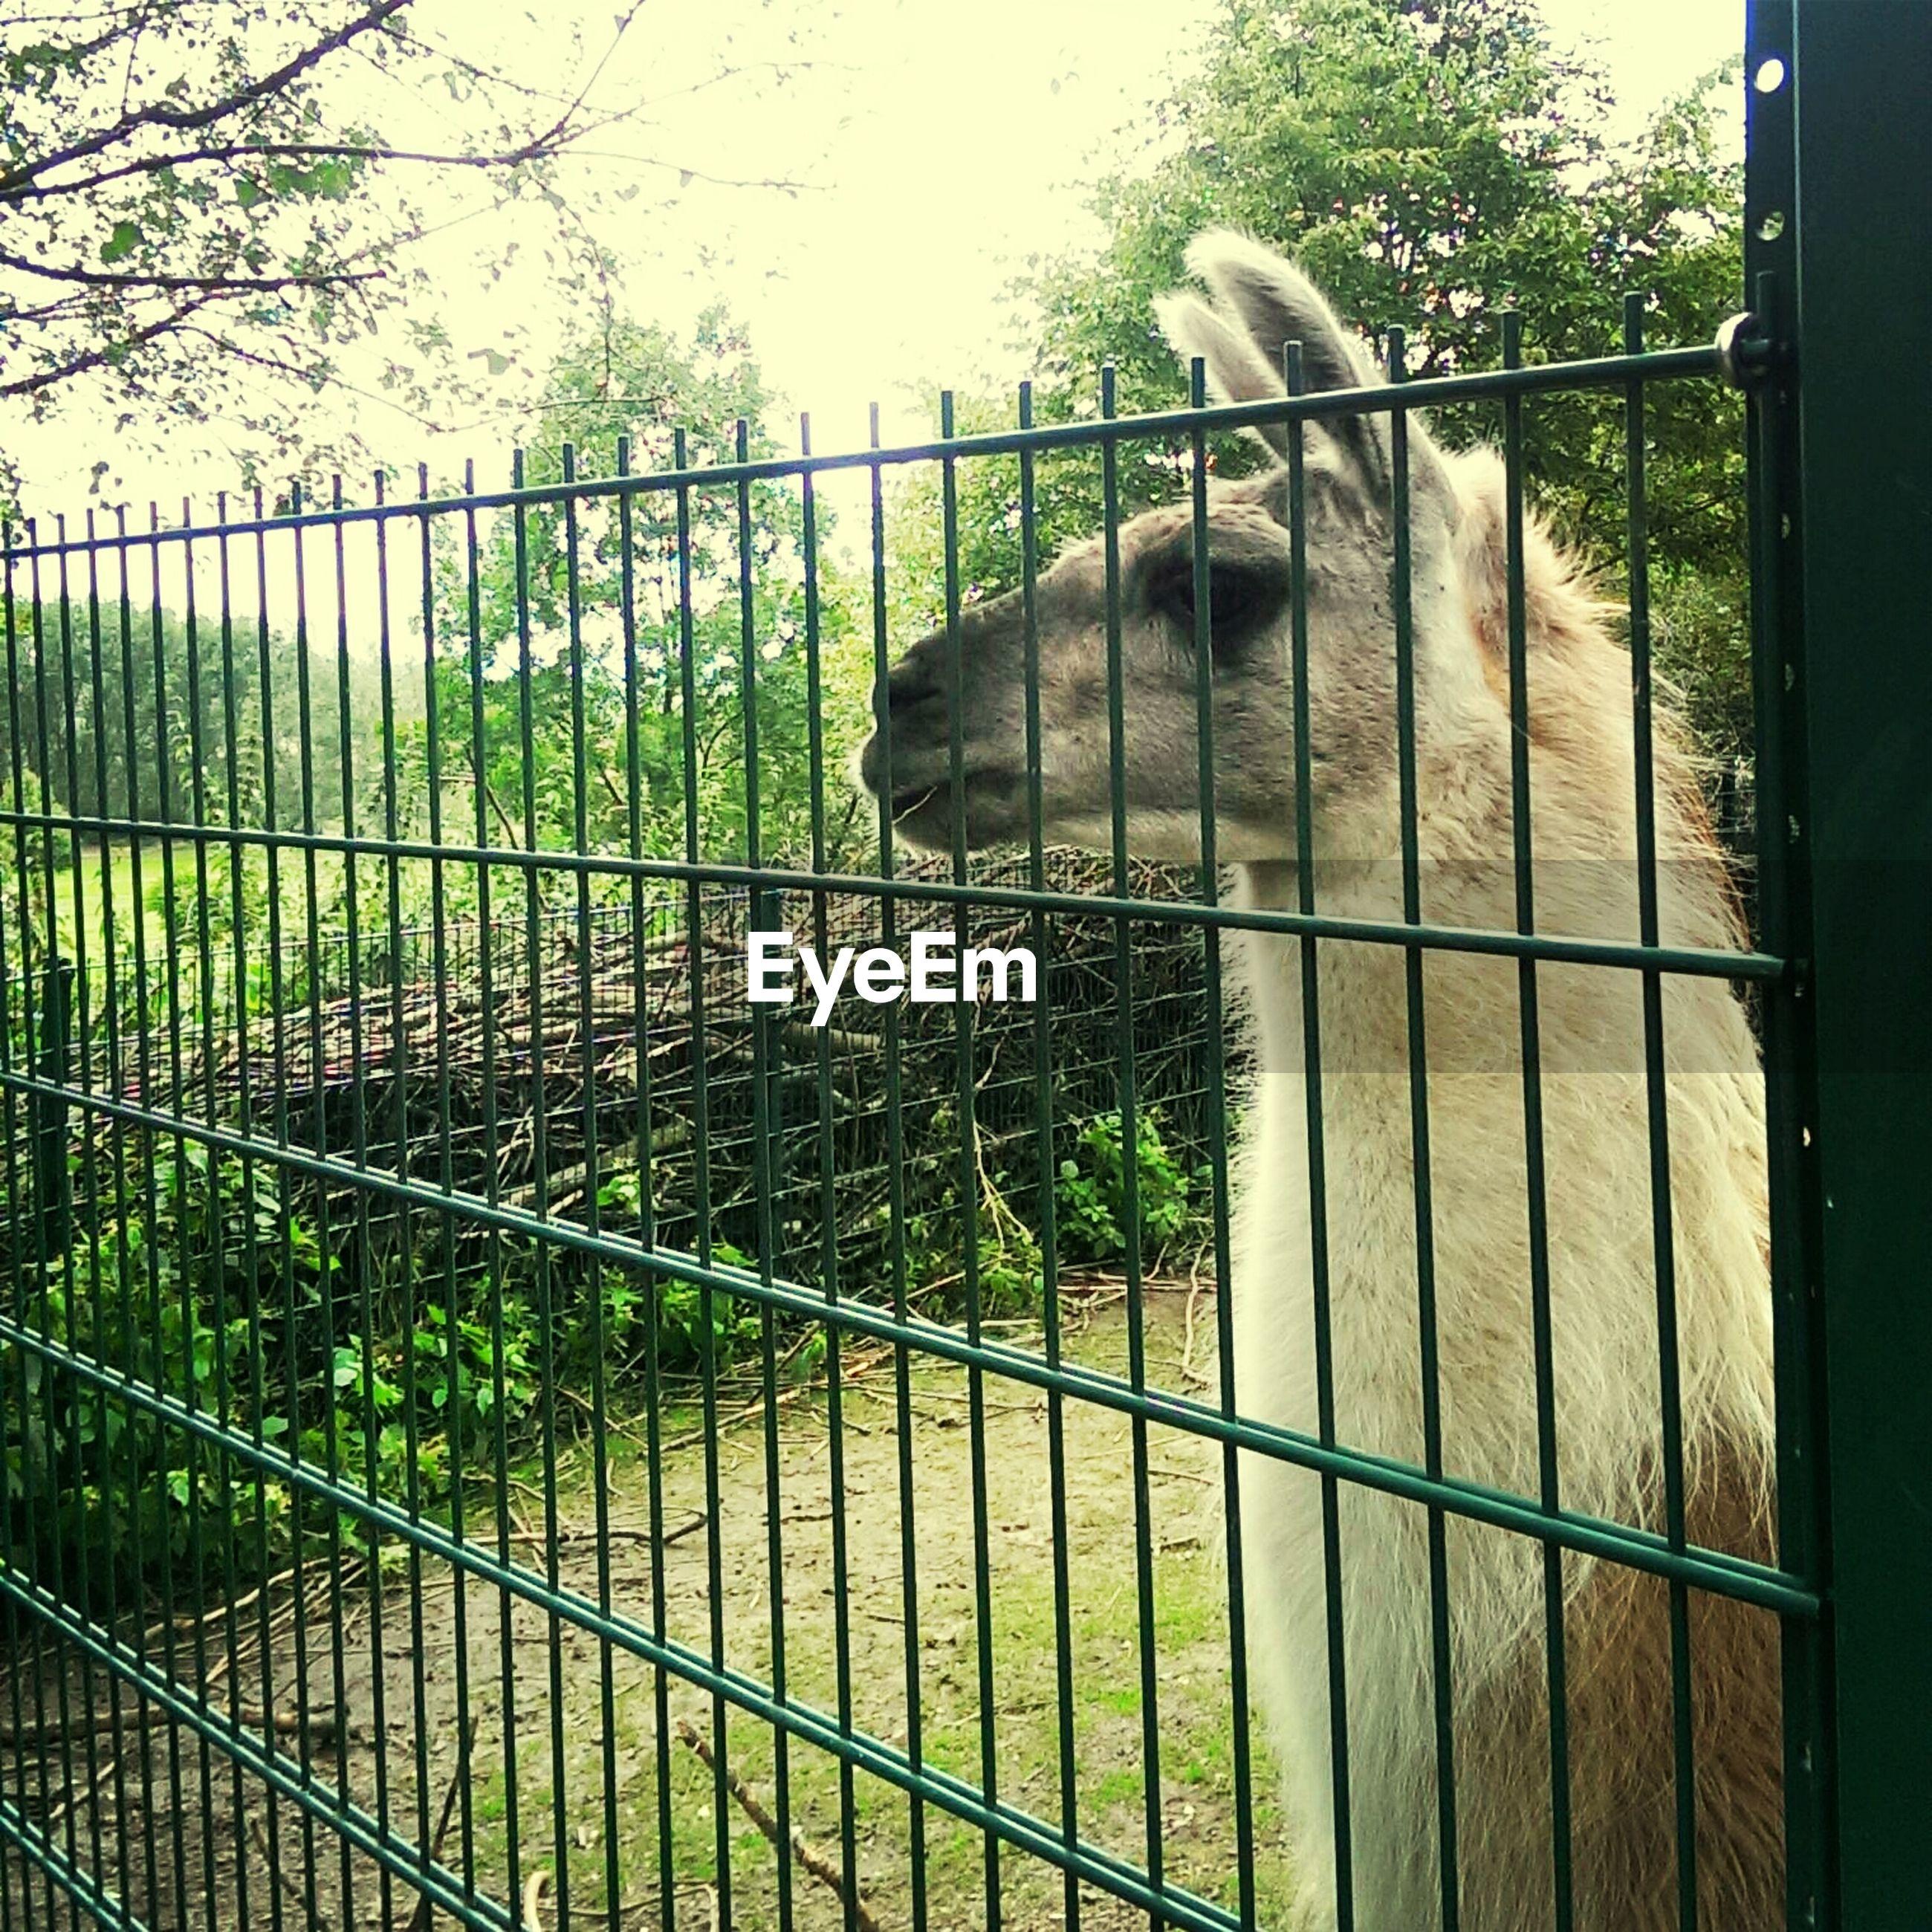 Llama seen through fence in zoo